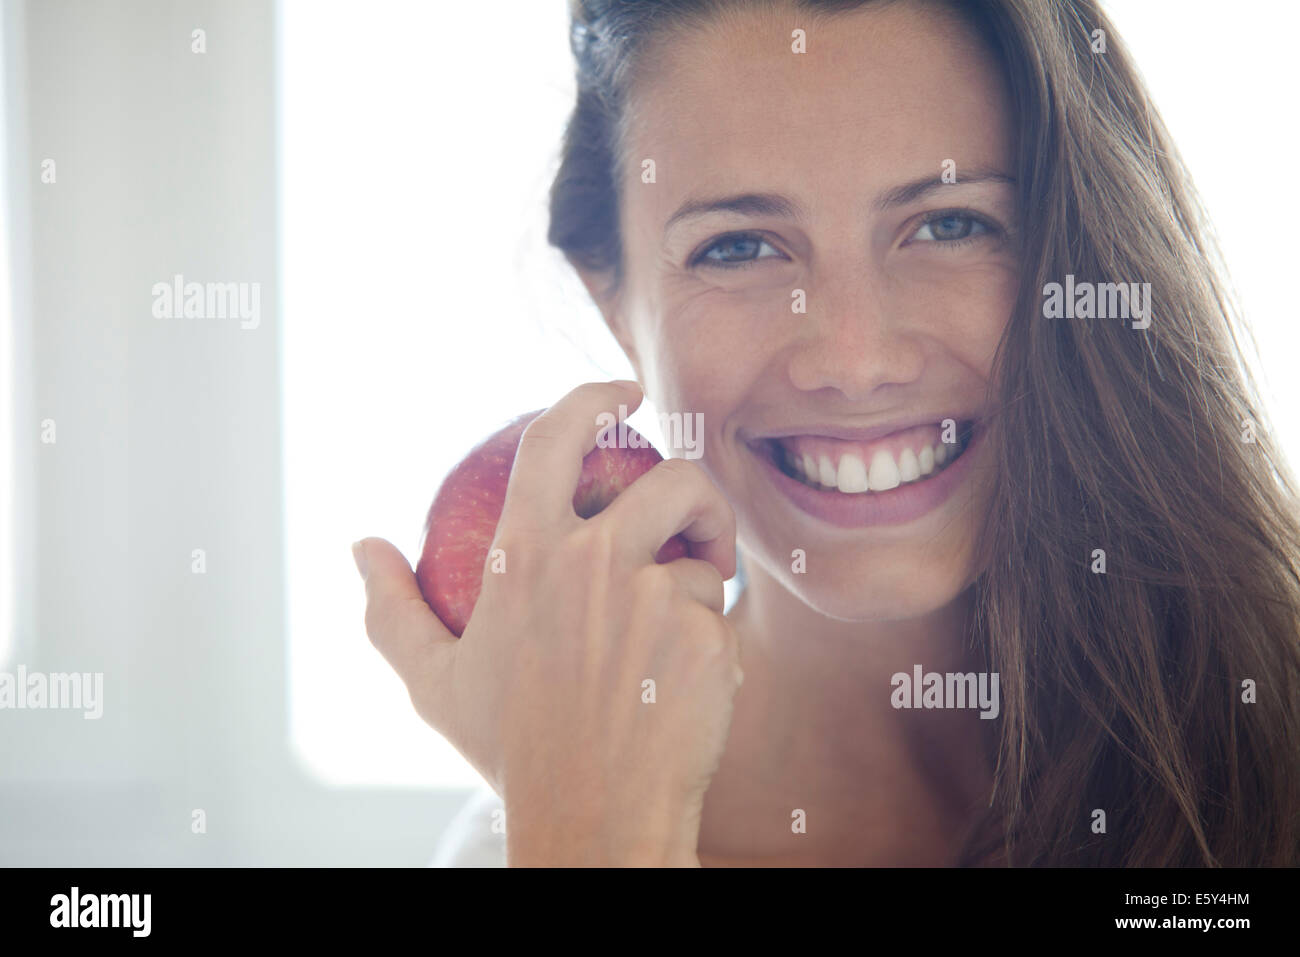 Woman holding apple, portrait - Stock Image